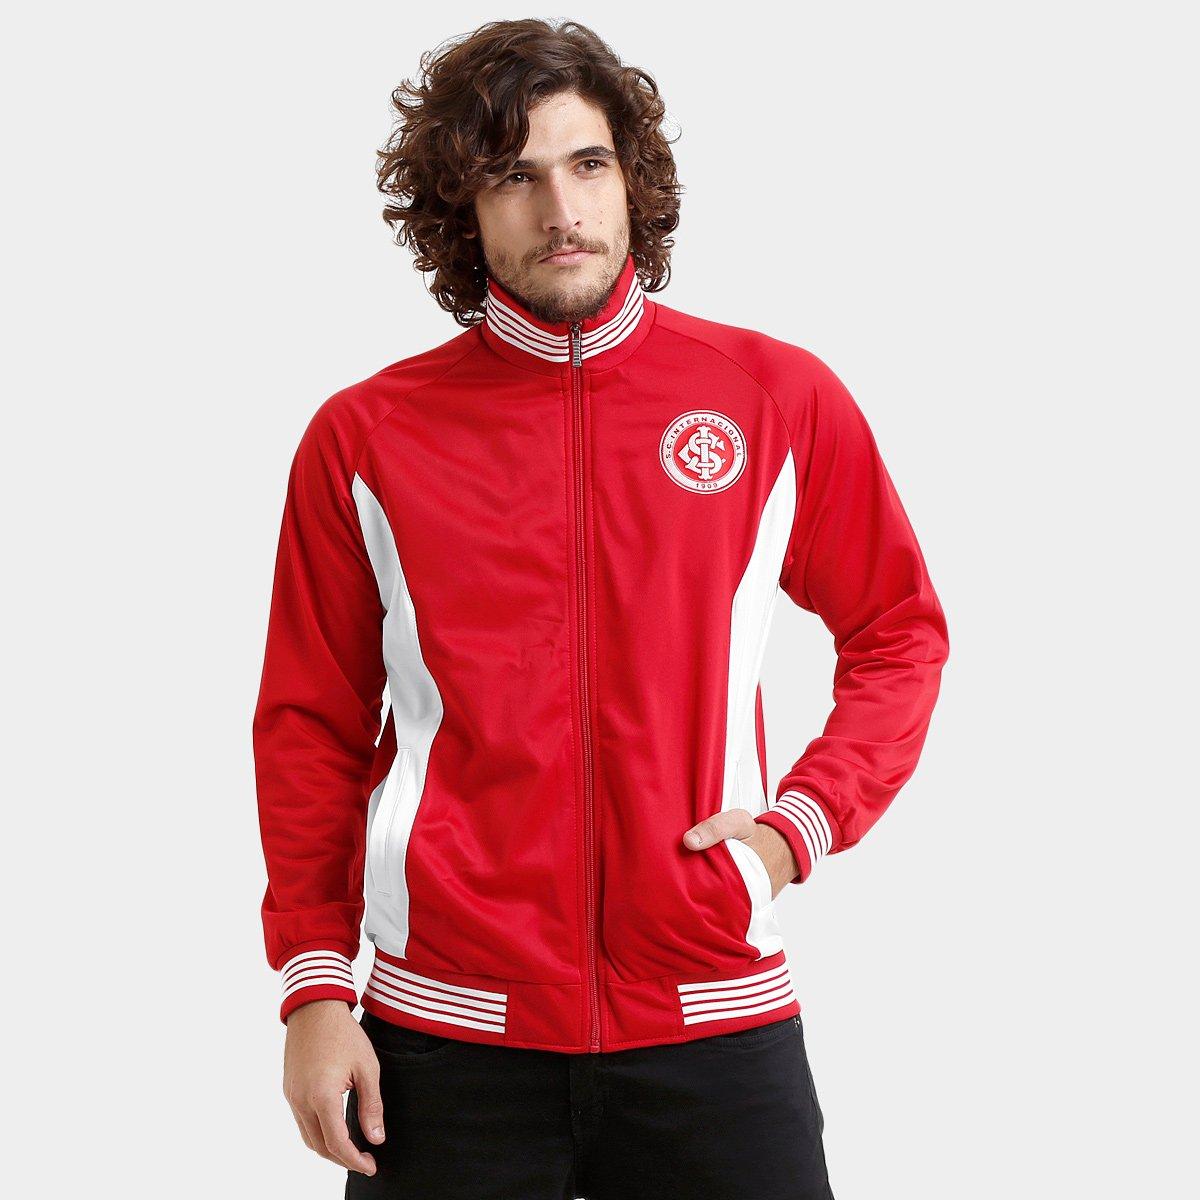 e3051621f5a84 Jaqueta Internacional Trilobal Masculina - Compre Agora